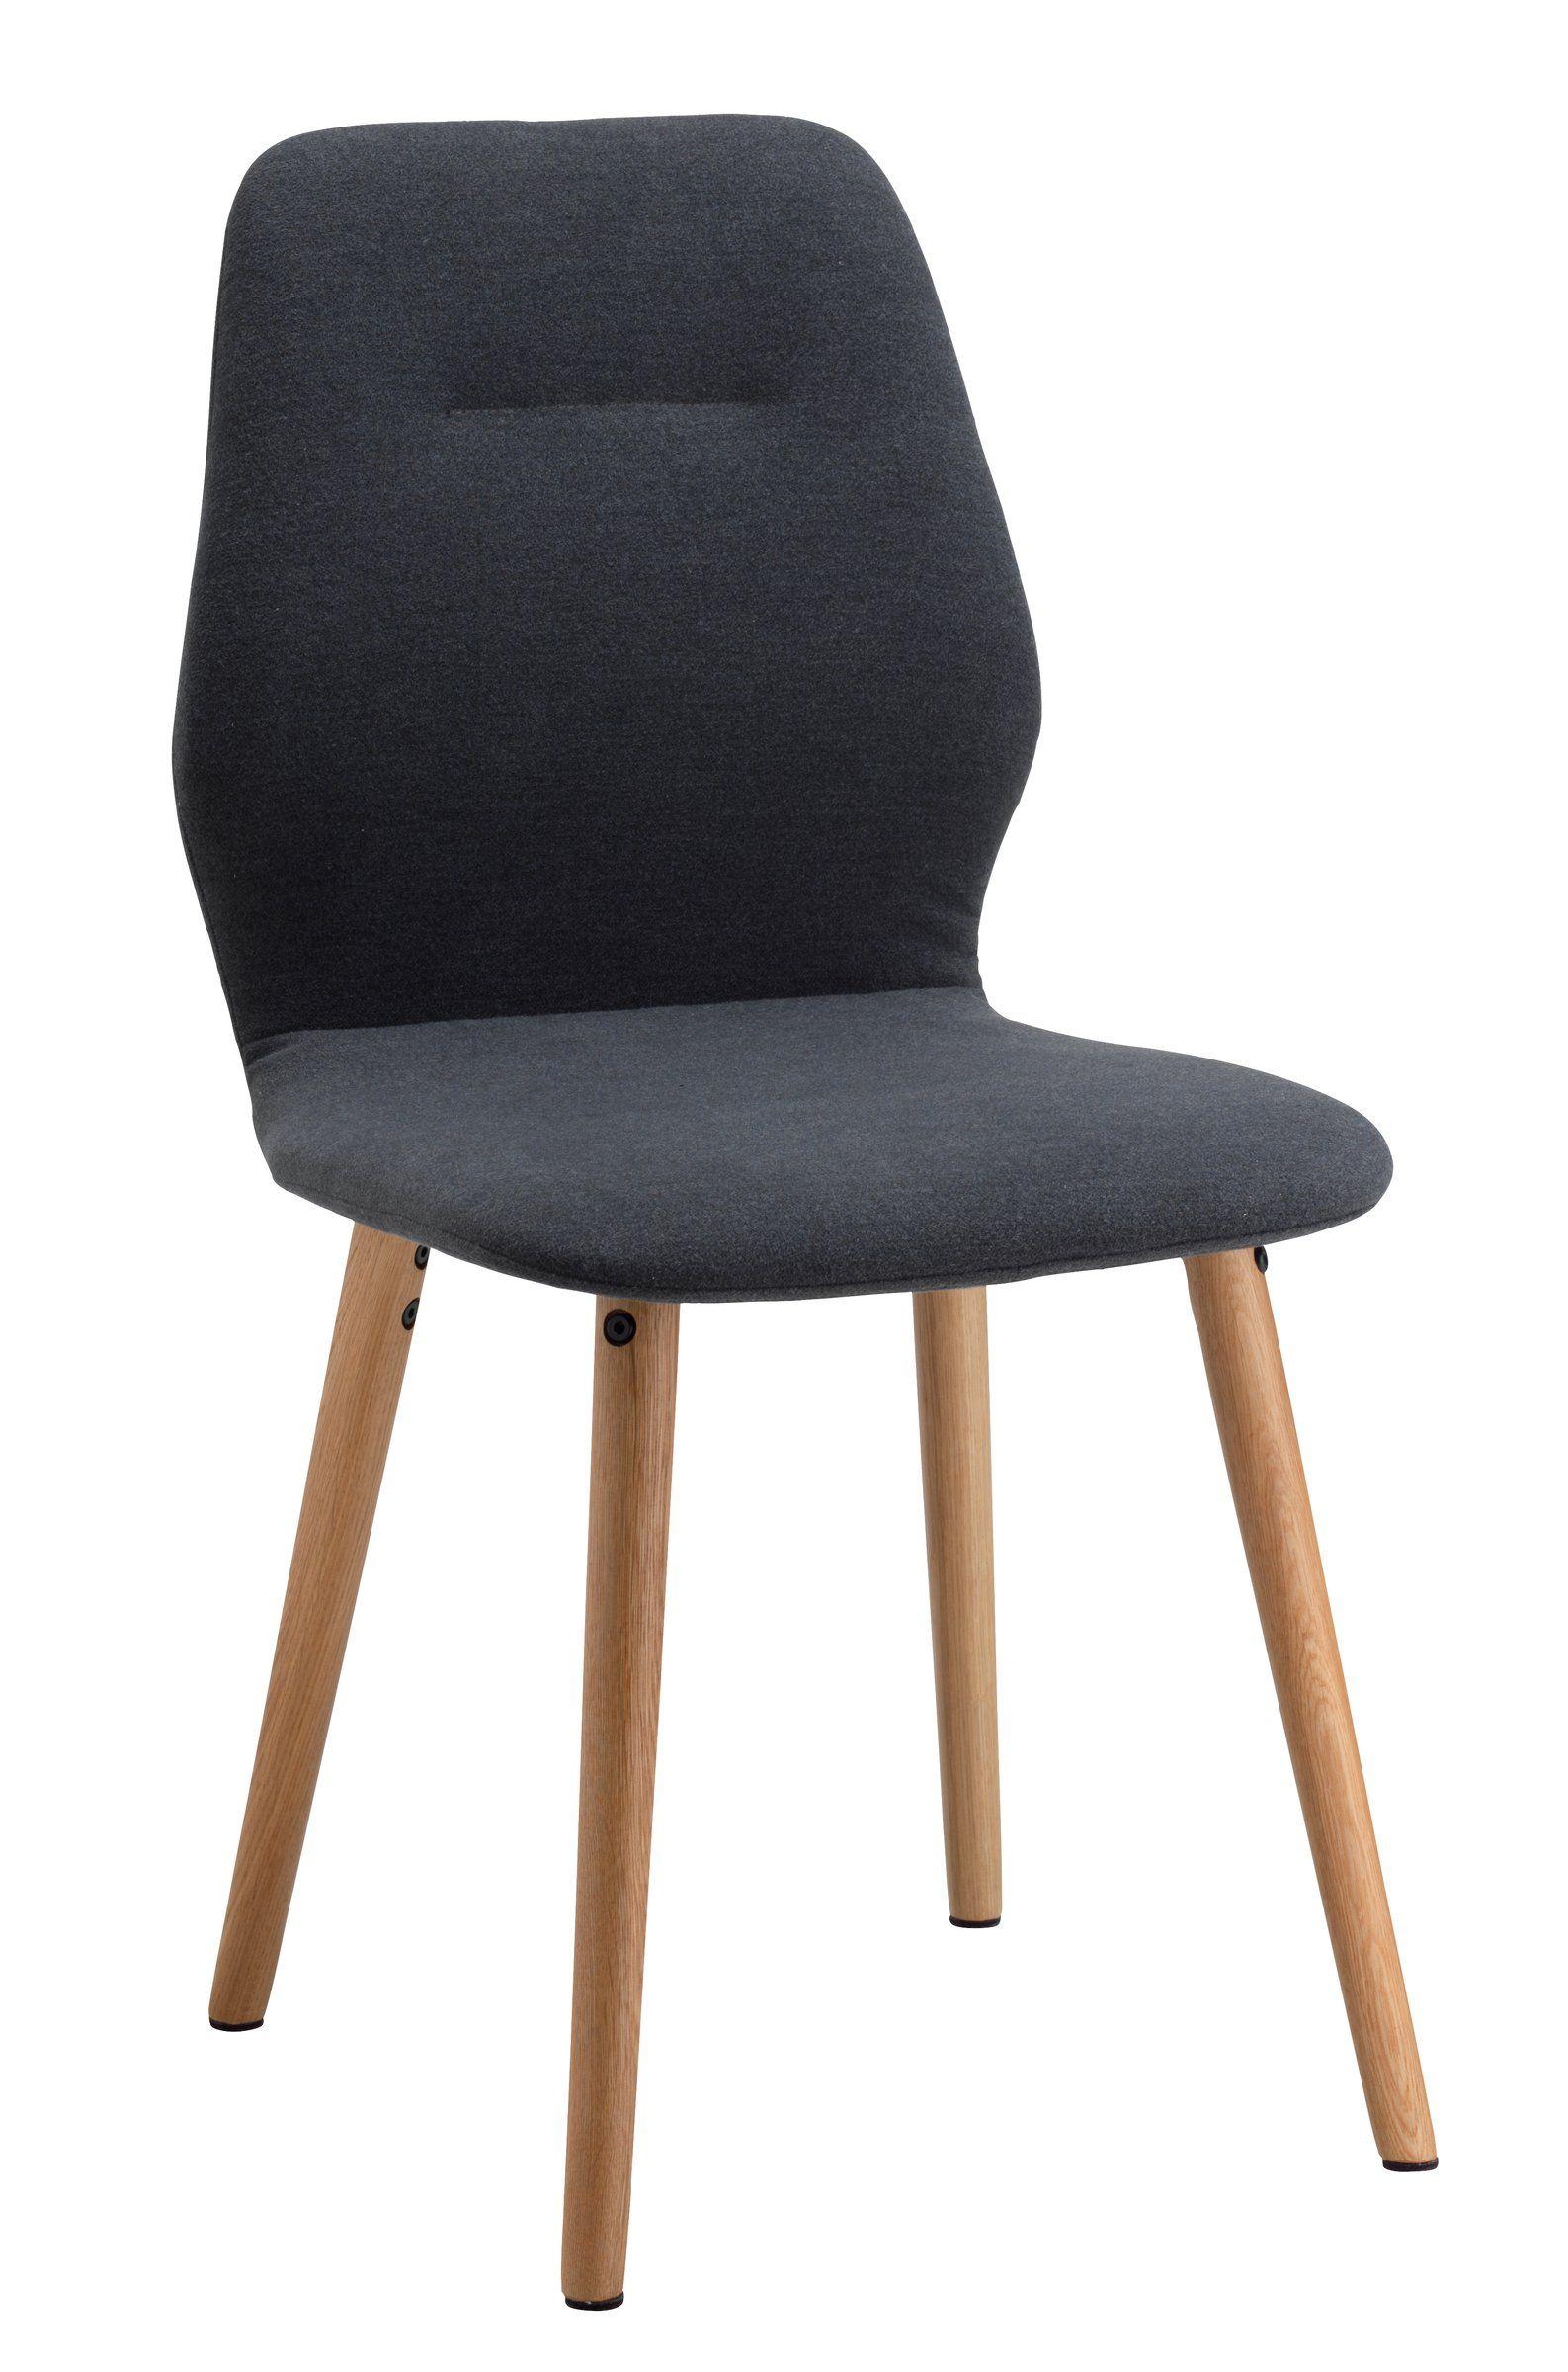 Stühle beine Aus SenecaBezug EicheHupplodge Filz Stuhl rCoedxB